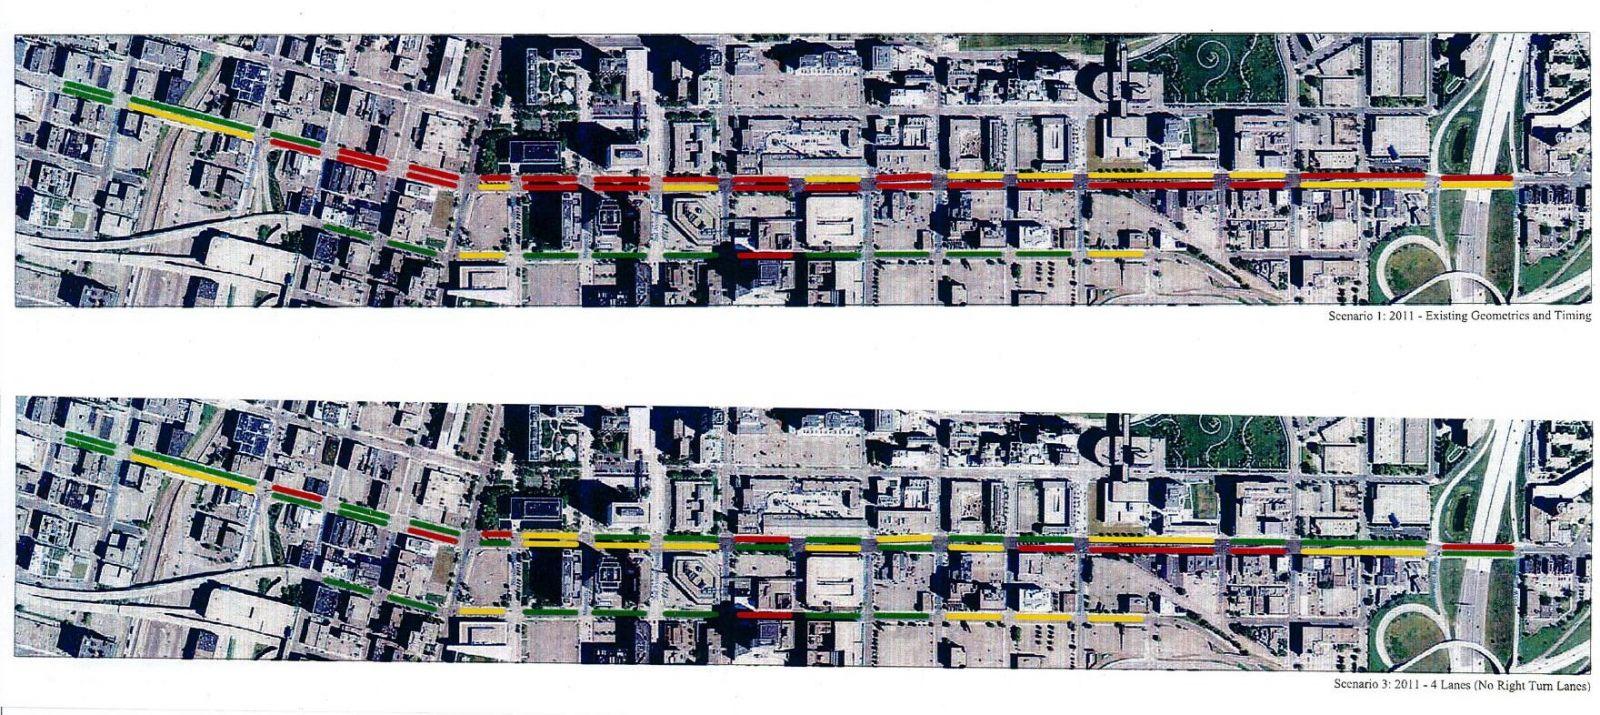 Comparison of traffic flow on Washington - current 7 lanes vs 5 lanes